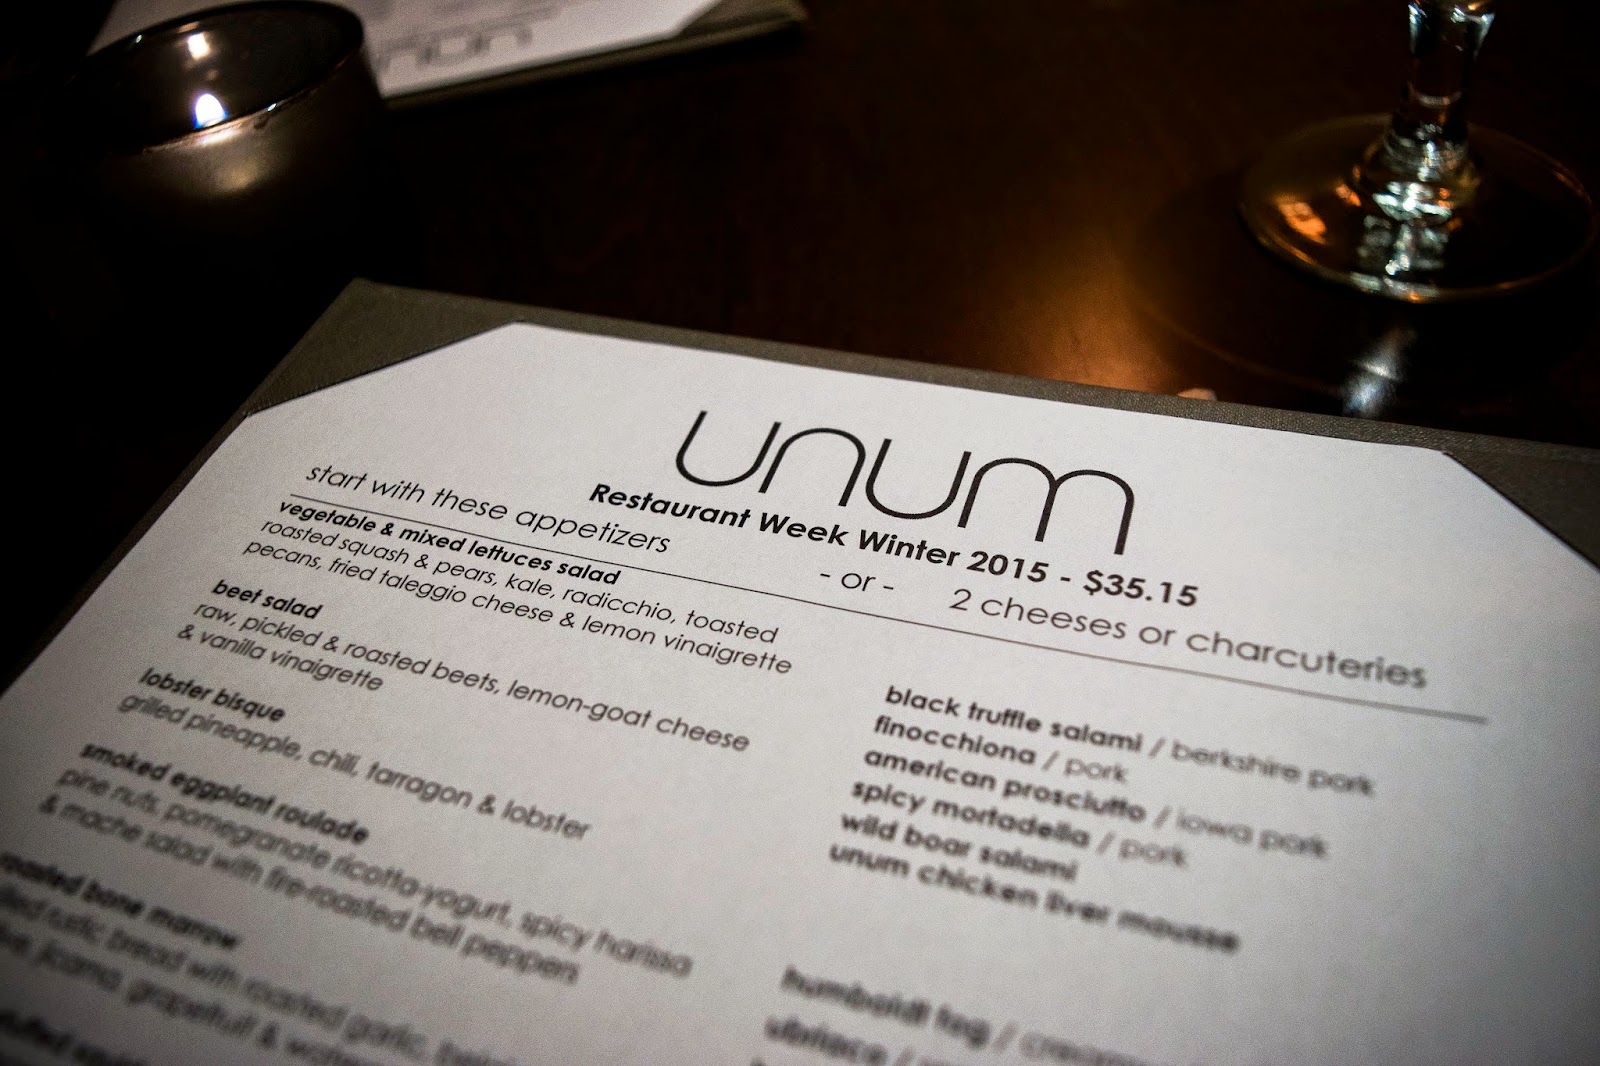 Unum Dc Restaurant Week Menu